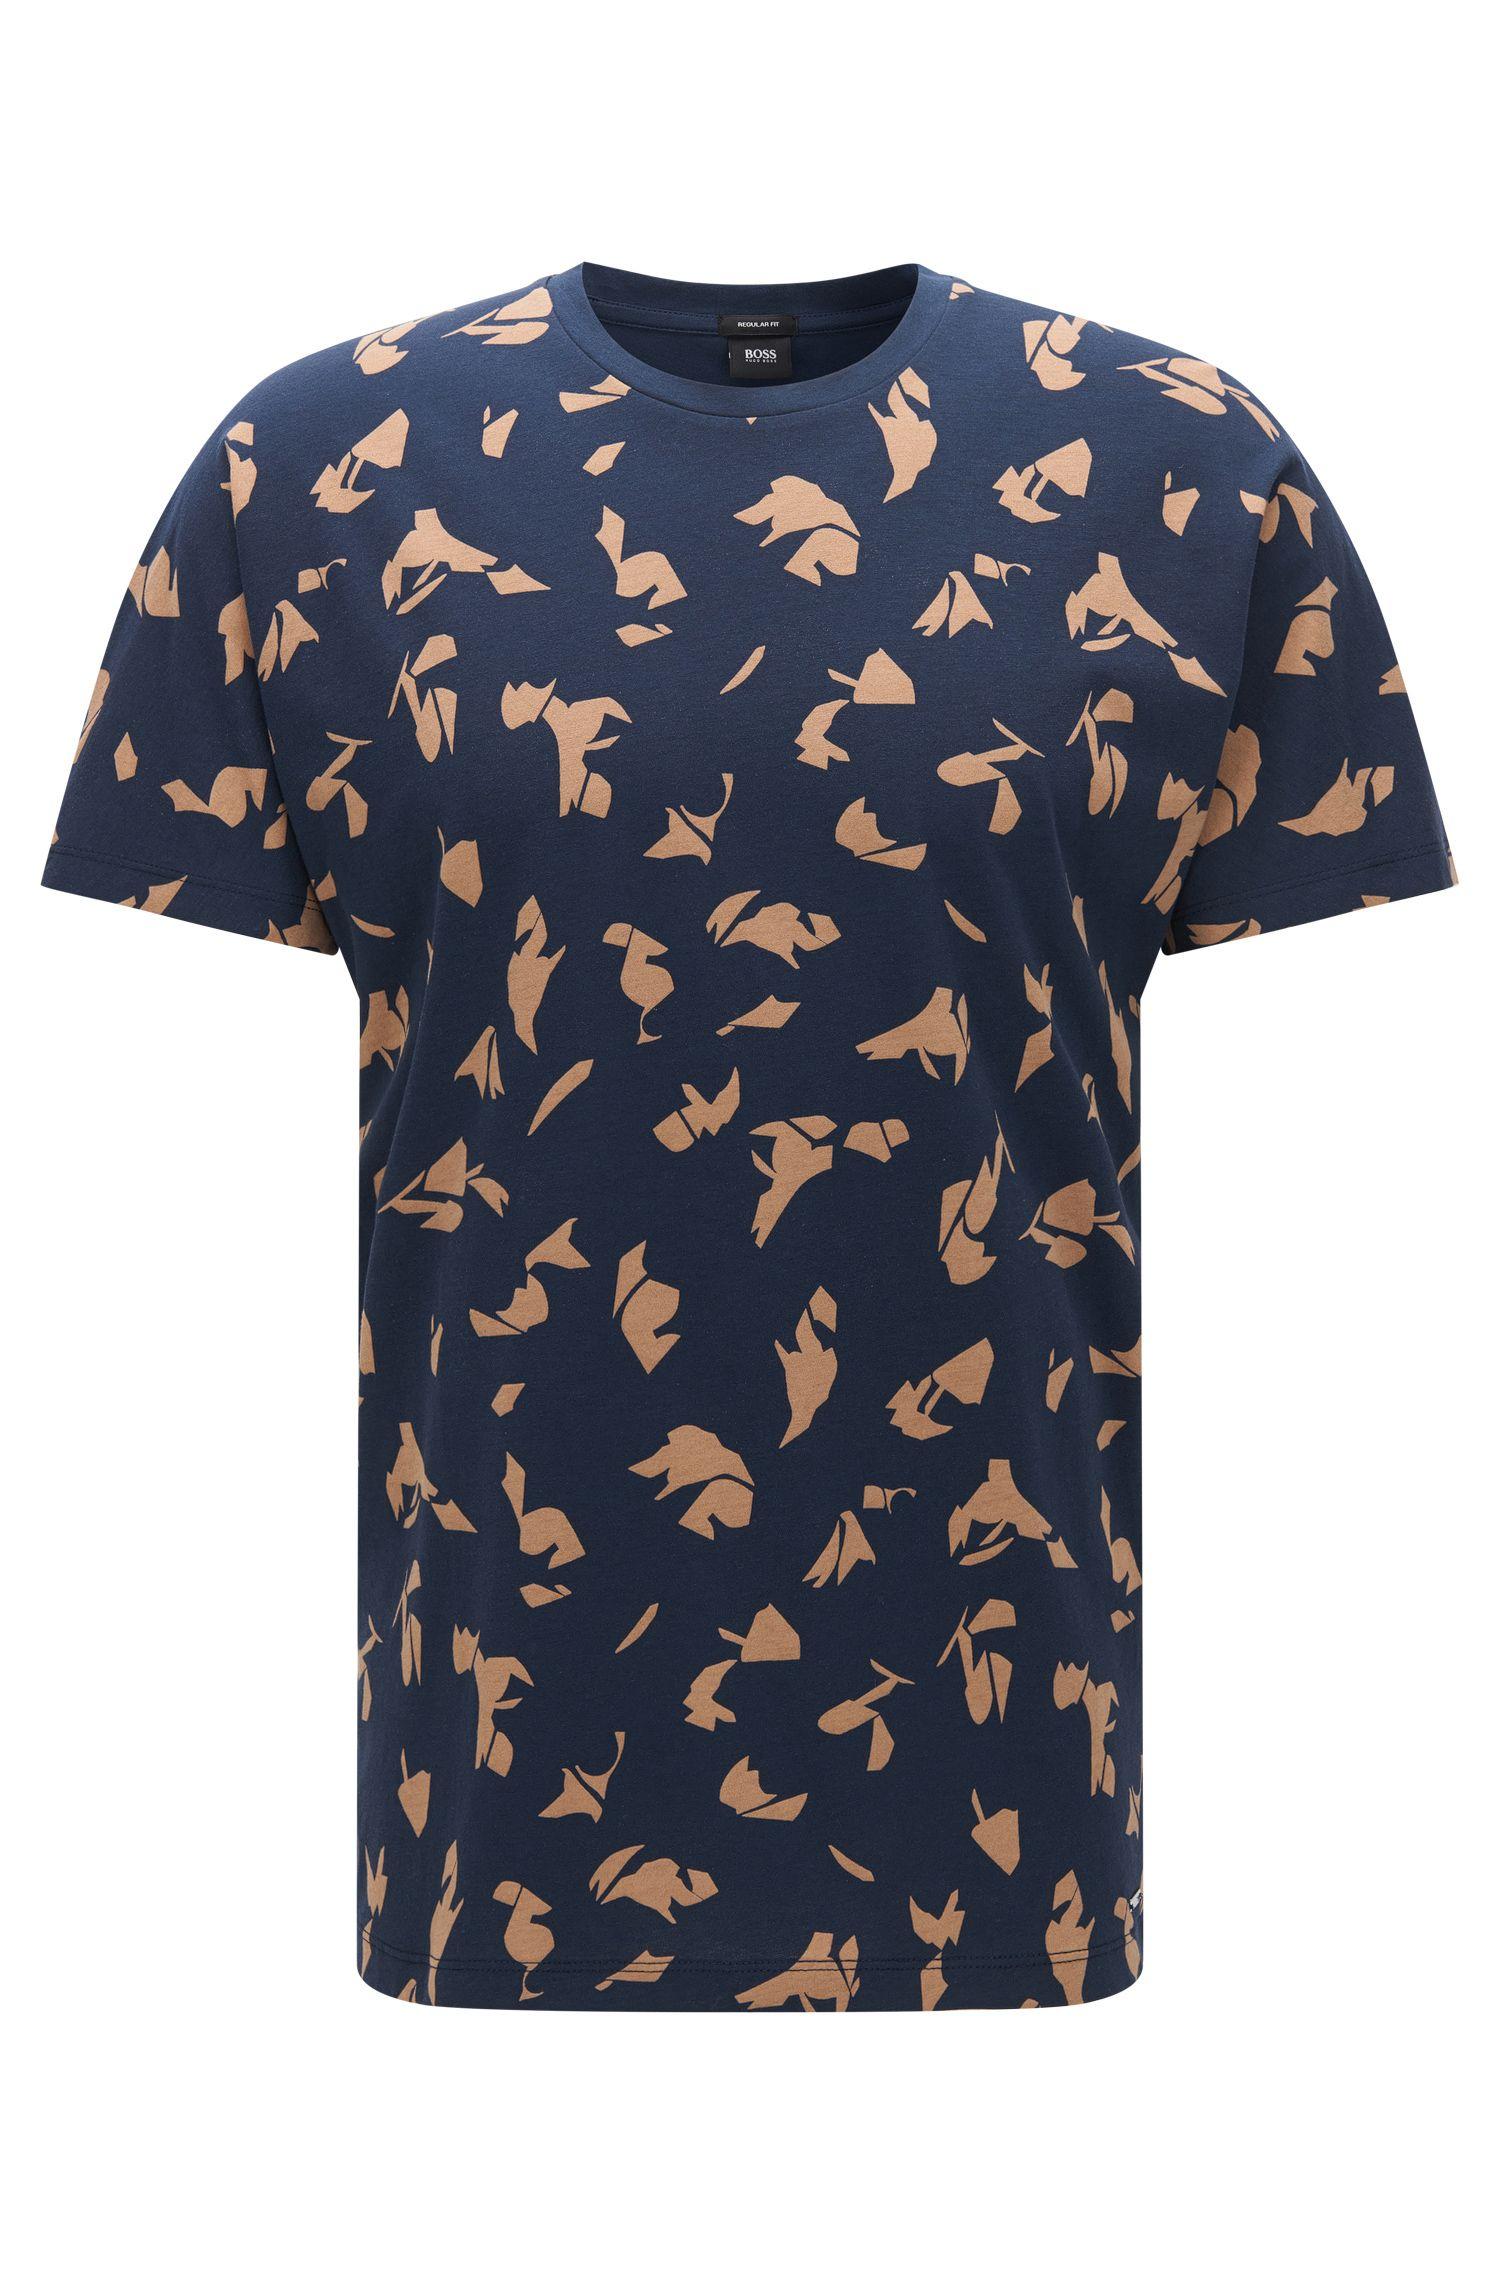 Patterned Cotton T-Shirt | Tiburt